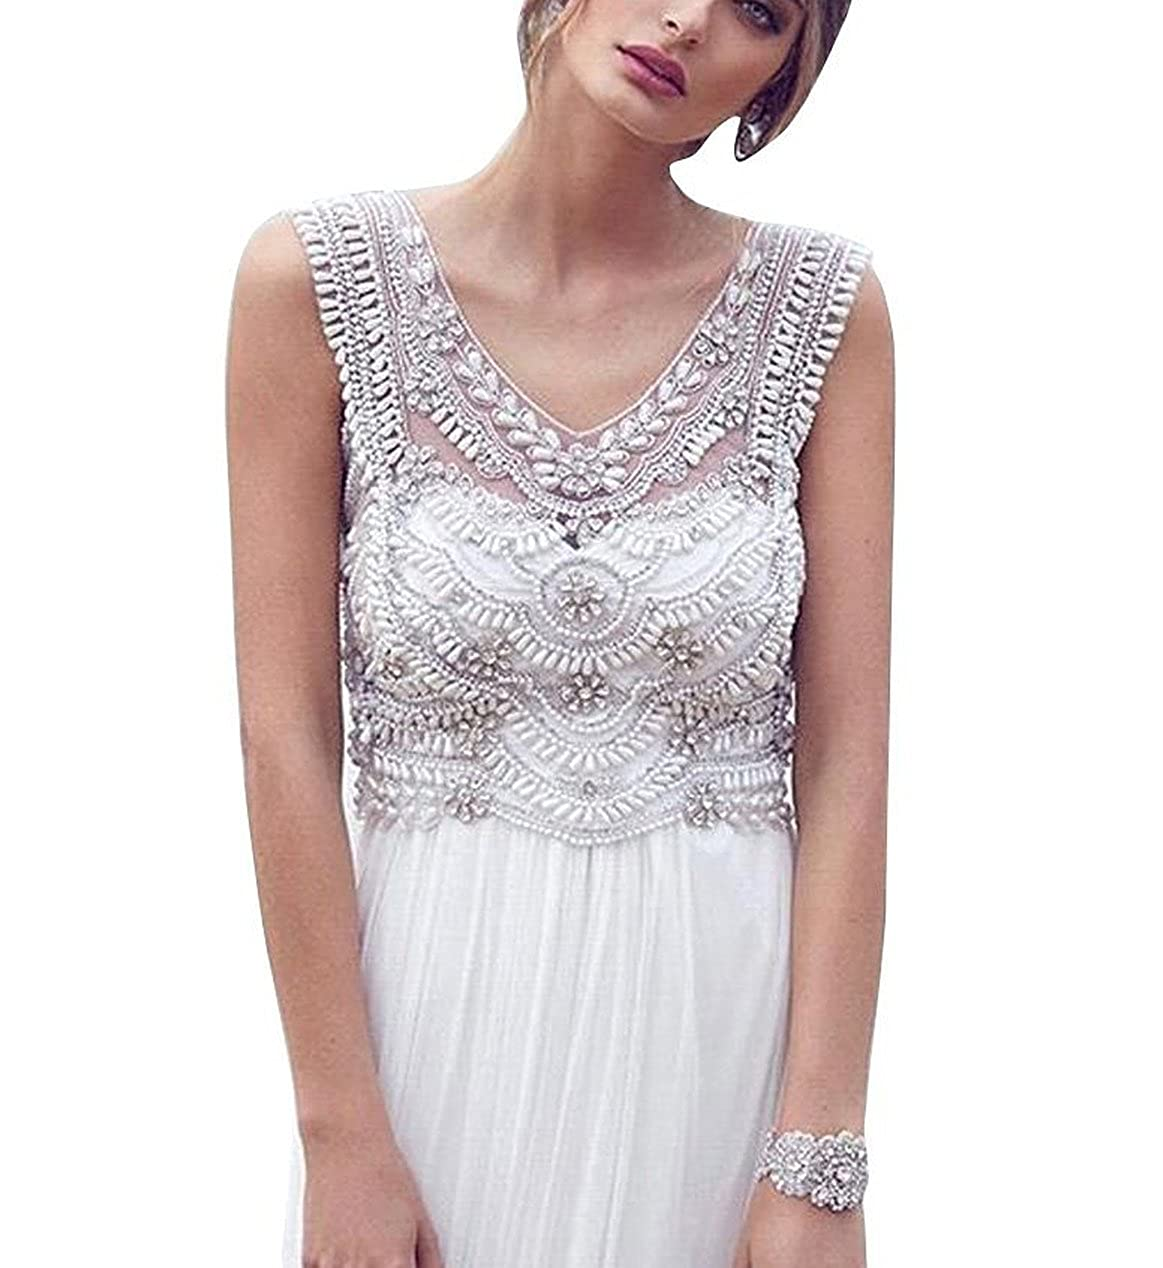 e2f7585bed2f7 Fanciest Women's Boho Wedding Dresses 2017 Chiffon Beach Wedding Dress  US26W at Amazon Women's Clothing store: